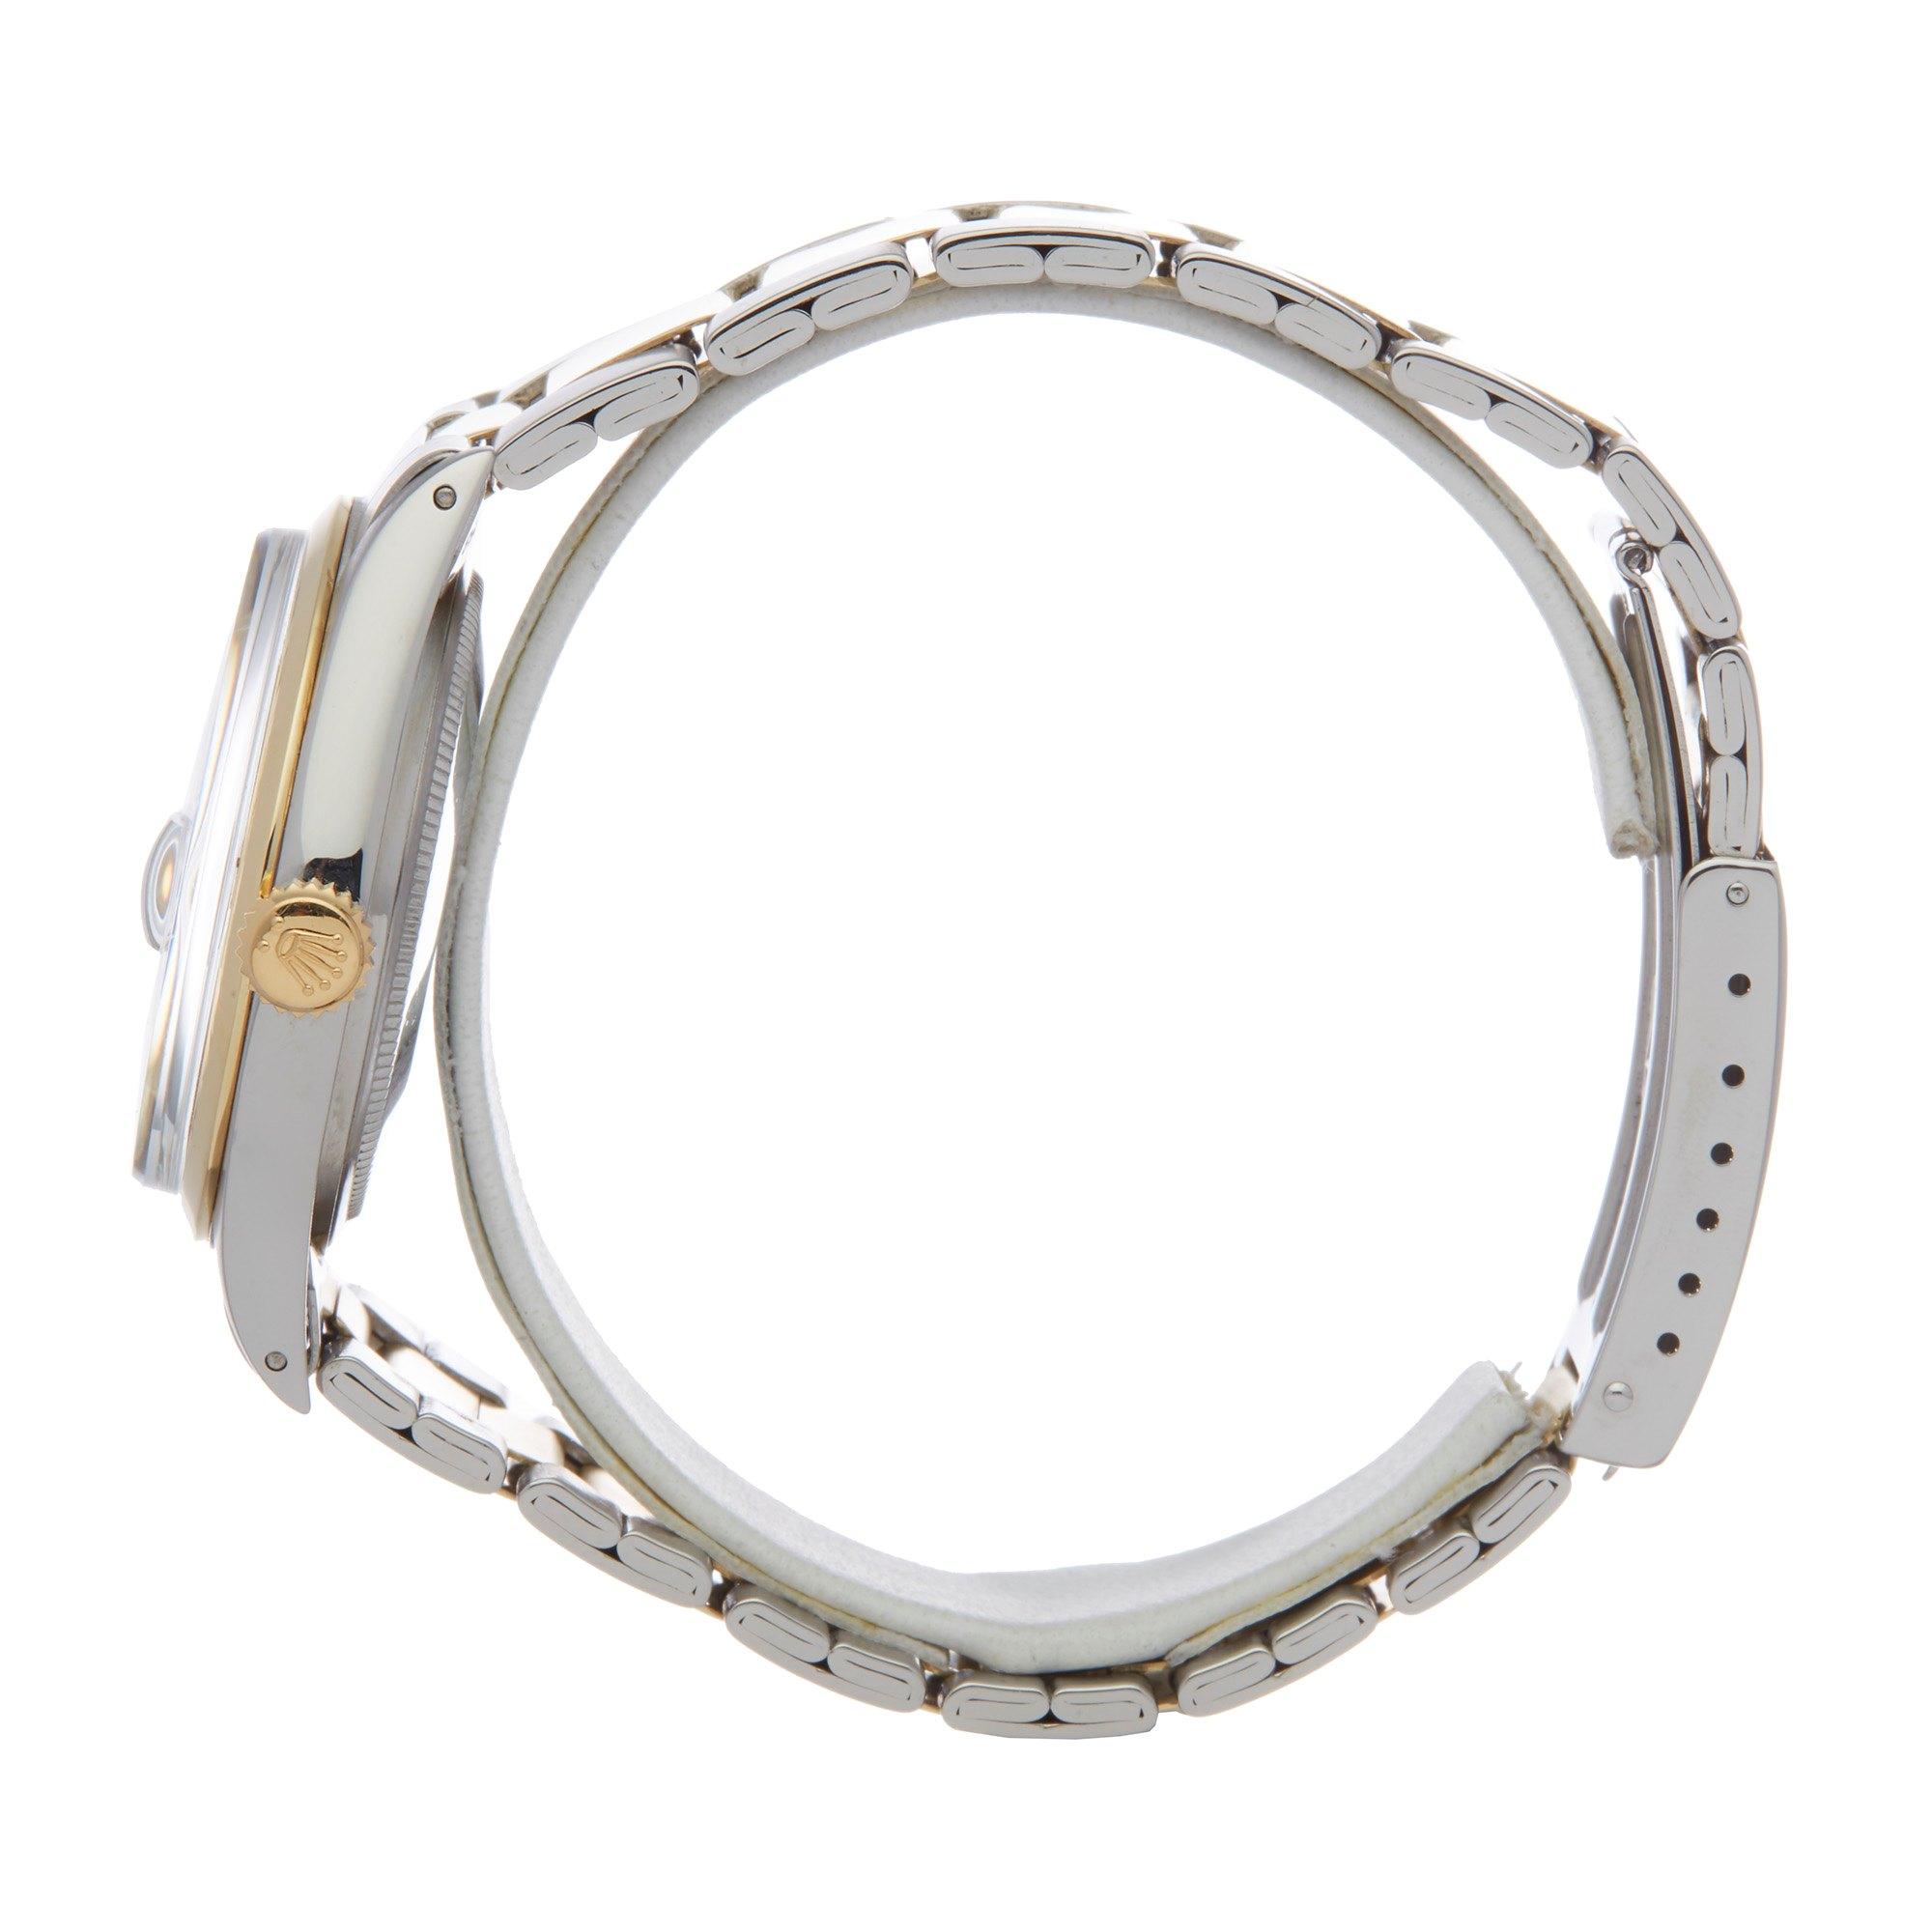 Lot 20 - Rolex Datejust 36 1600 Men Stainless Steel & Yellow Gold Watch